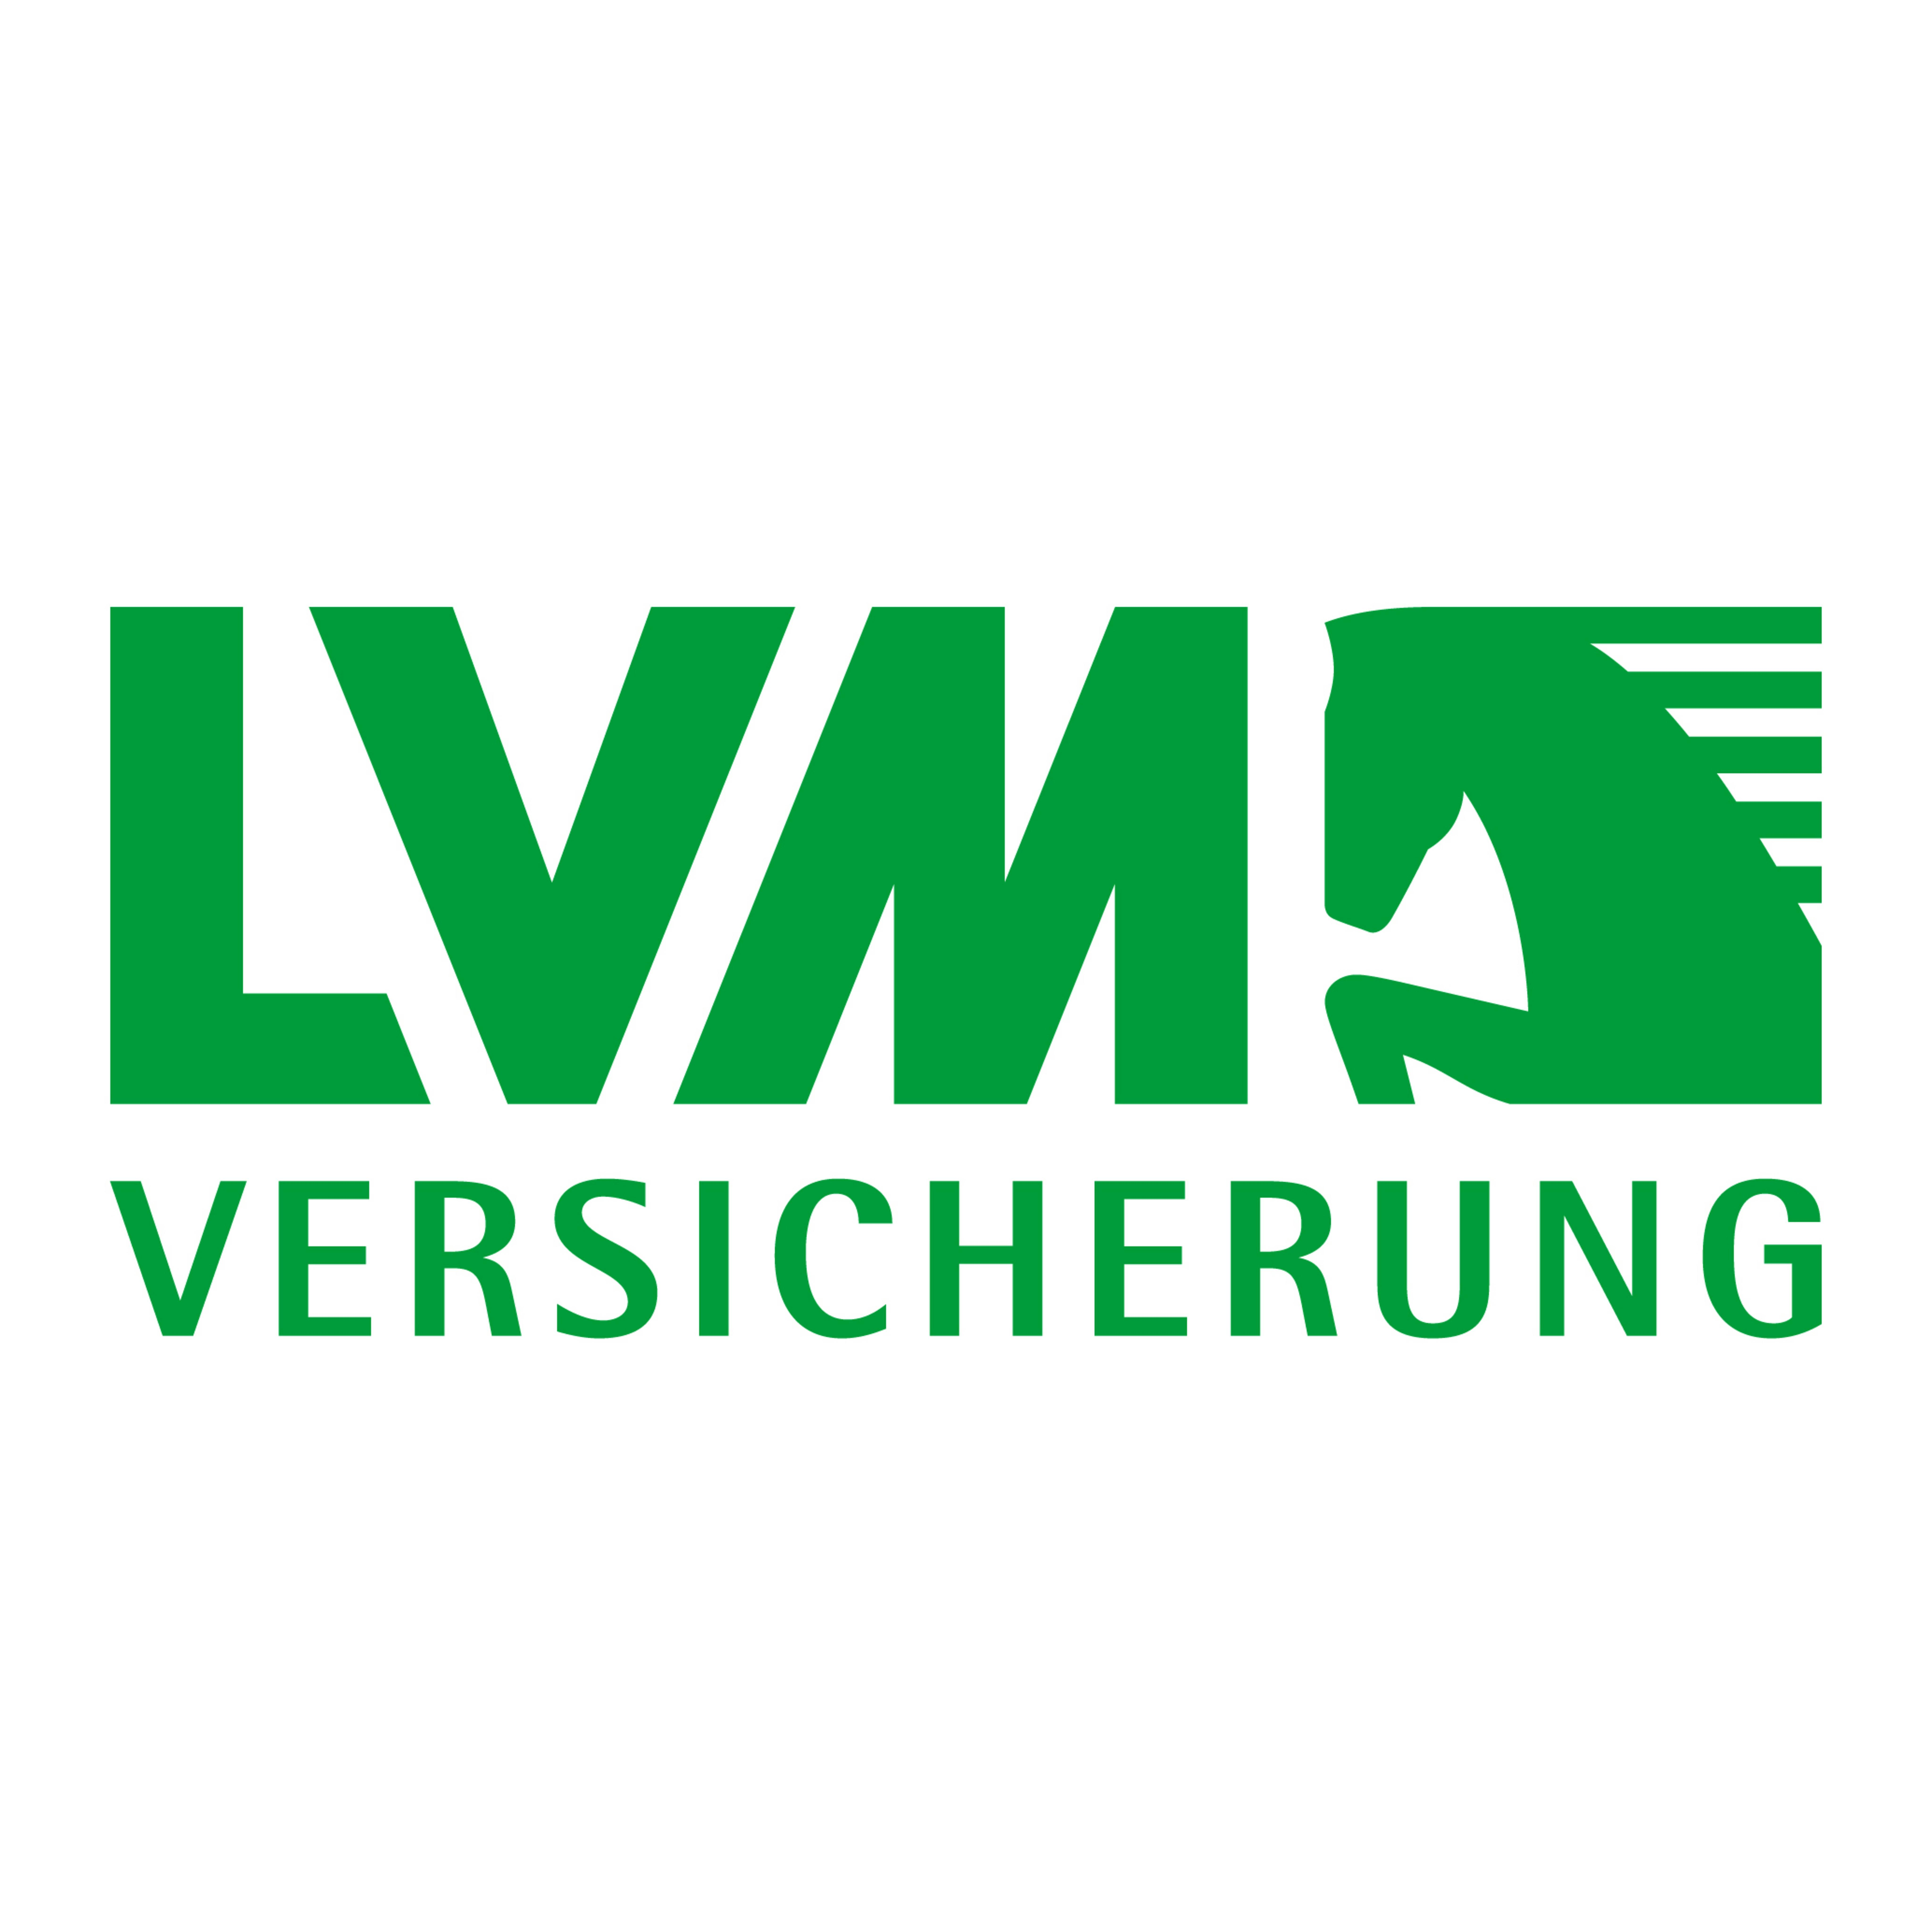 LVM Versicherung Warntjen KG - Versicherungsagentur